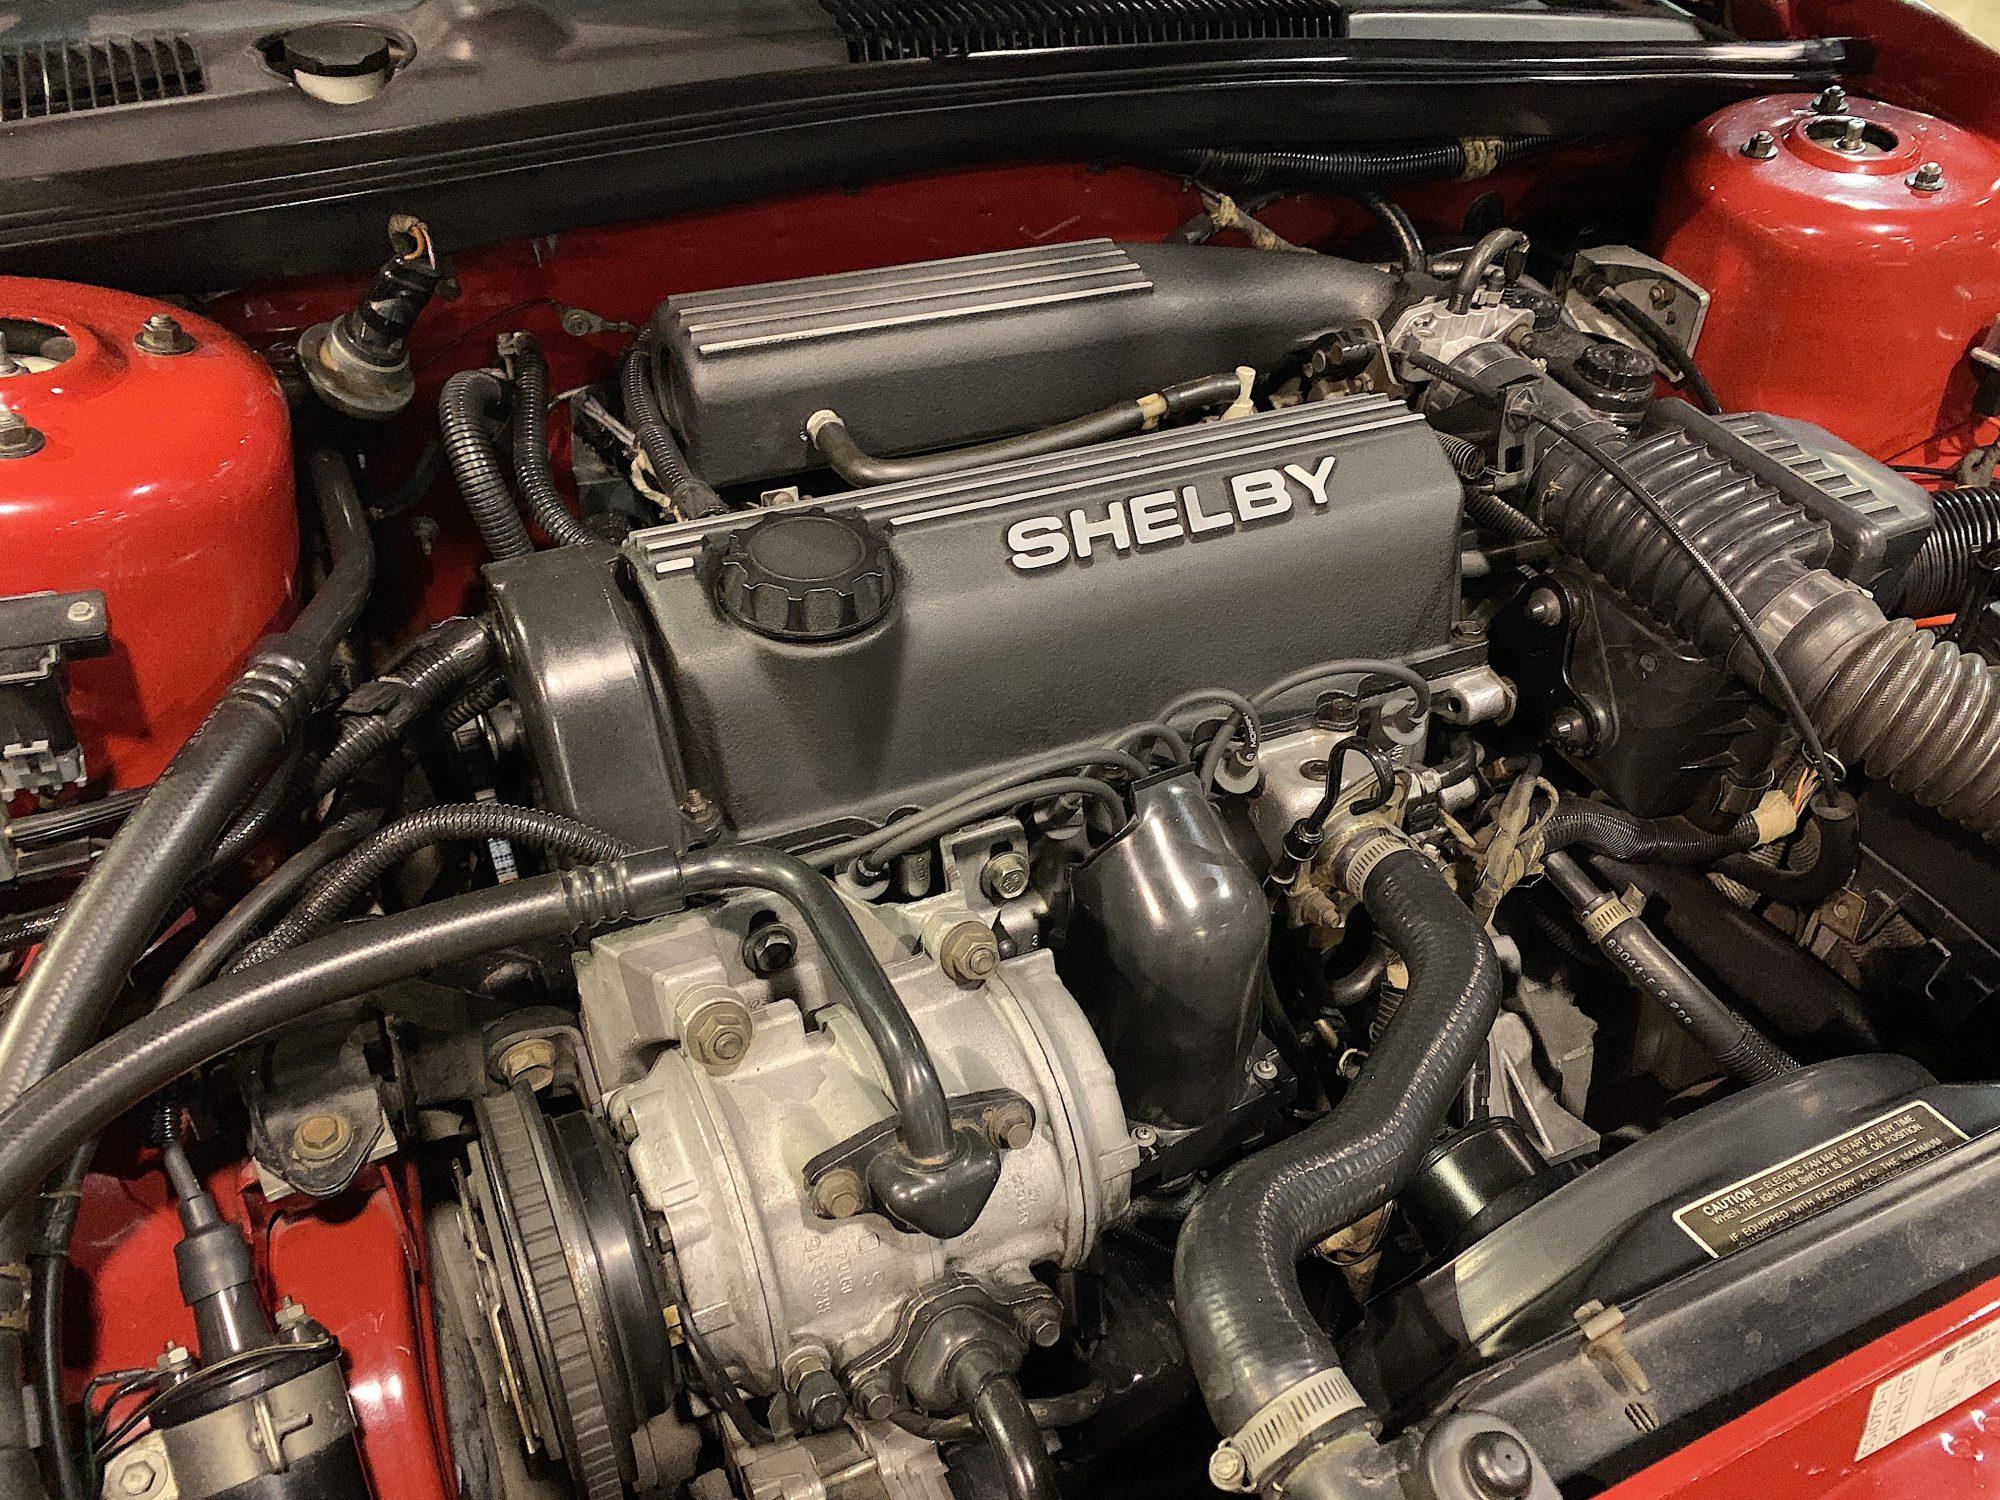 Engine of Shelby Lancer